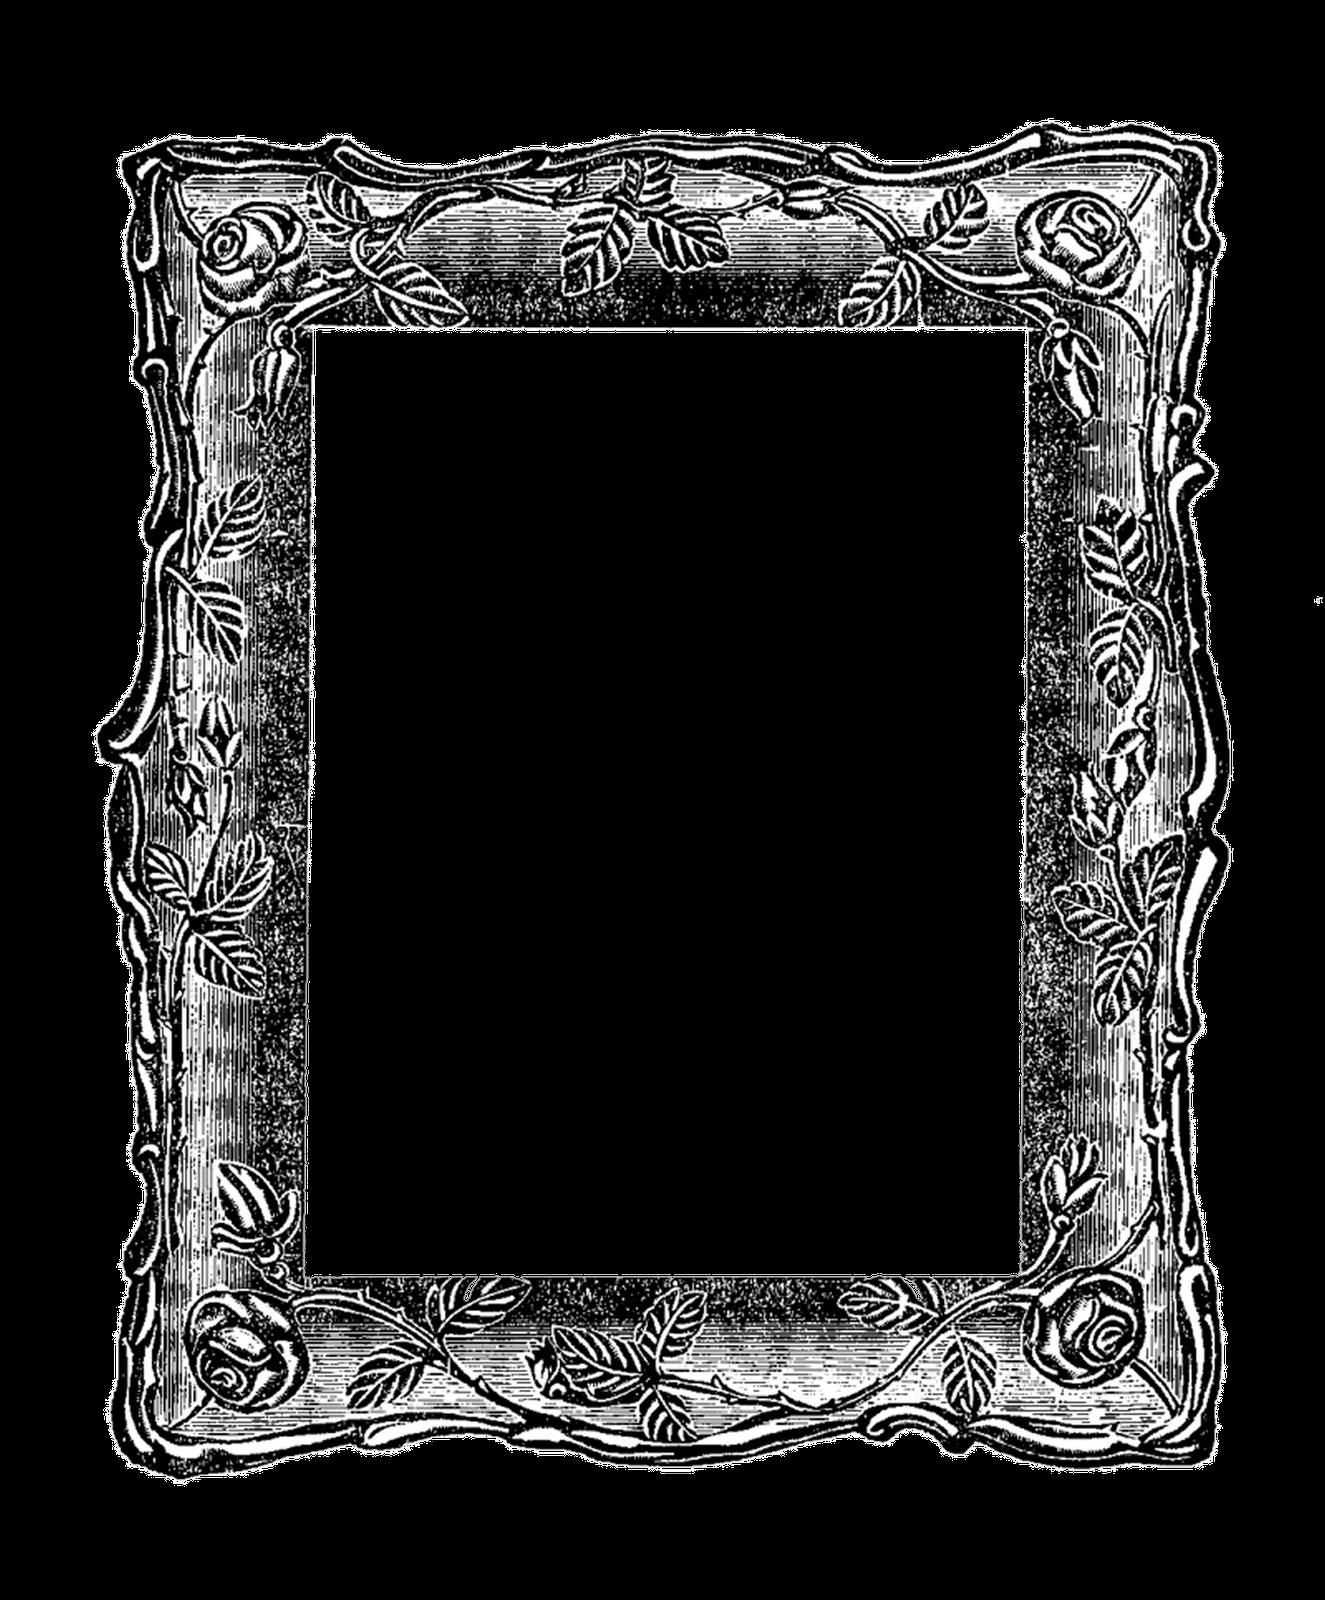 Images: Vintage Graphic: Decorative Square Frame Digital Clipart